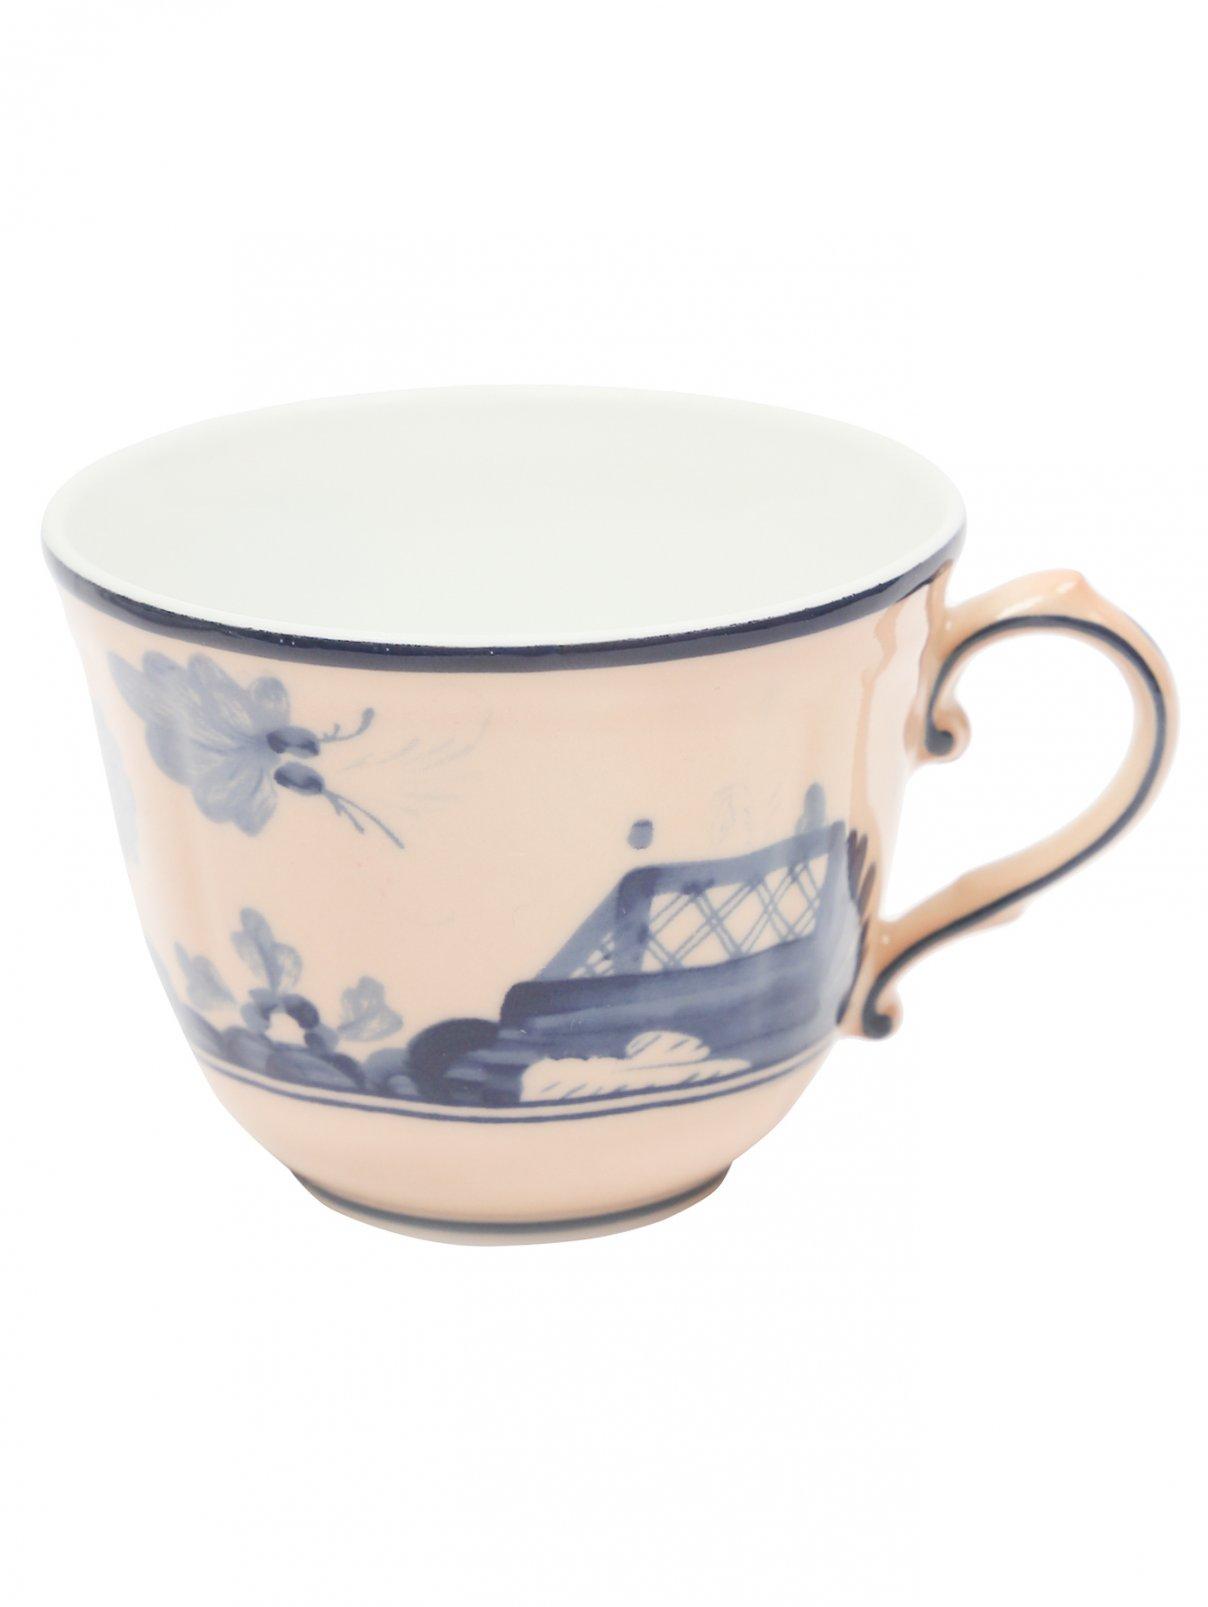 Чашка для кофе из фарфора с узором Richard Ginori 1735  –  Общий вид